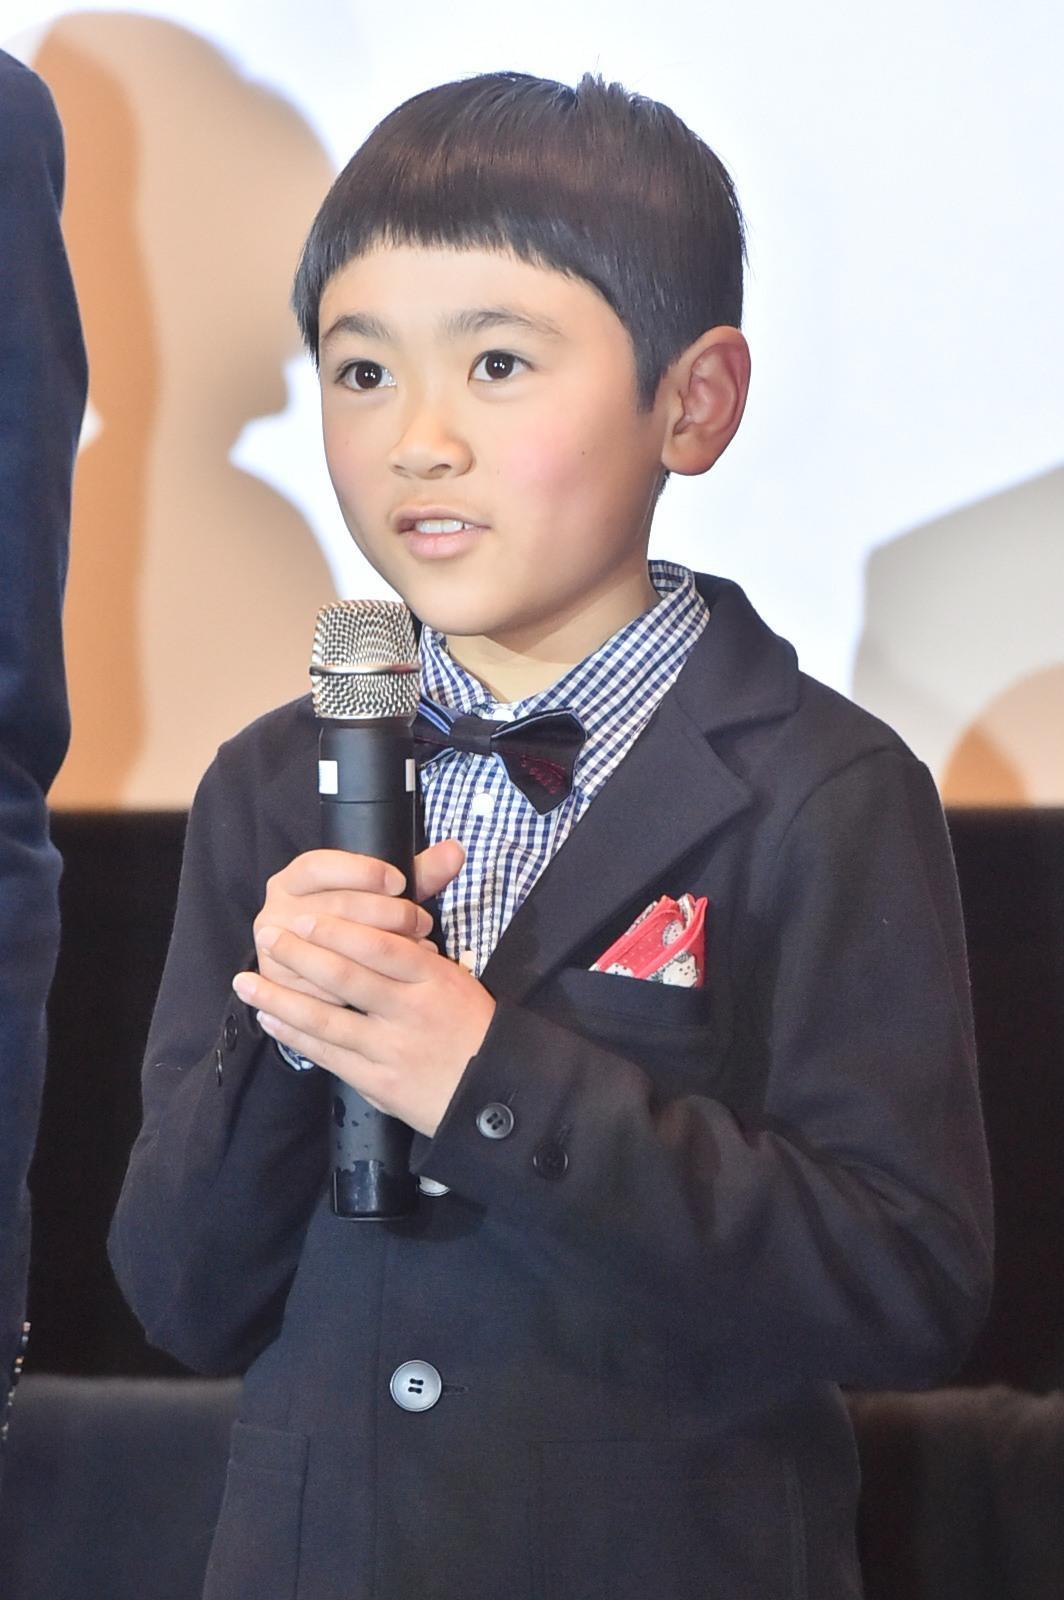 http://news.yoshimoto.co.jp/20190115124207-813136177bb18c0467bfa34ff1958c0949715dda.jpg